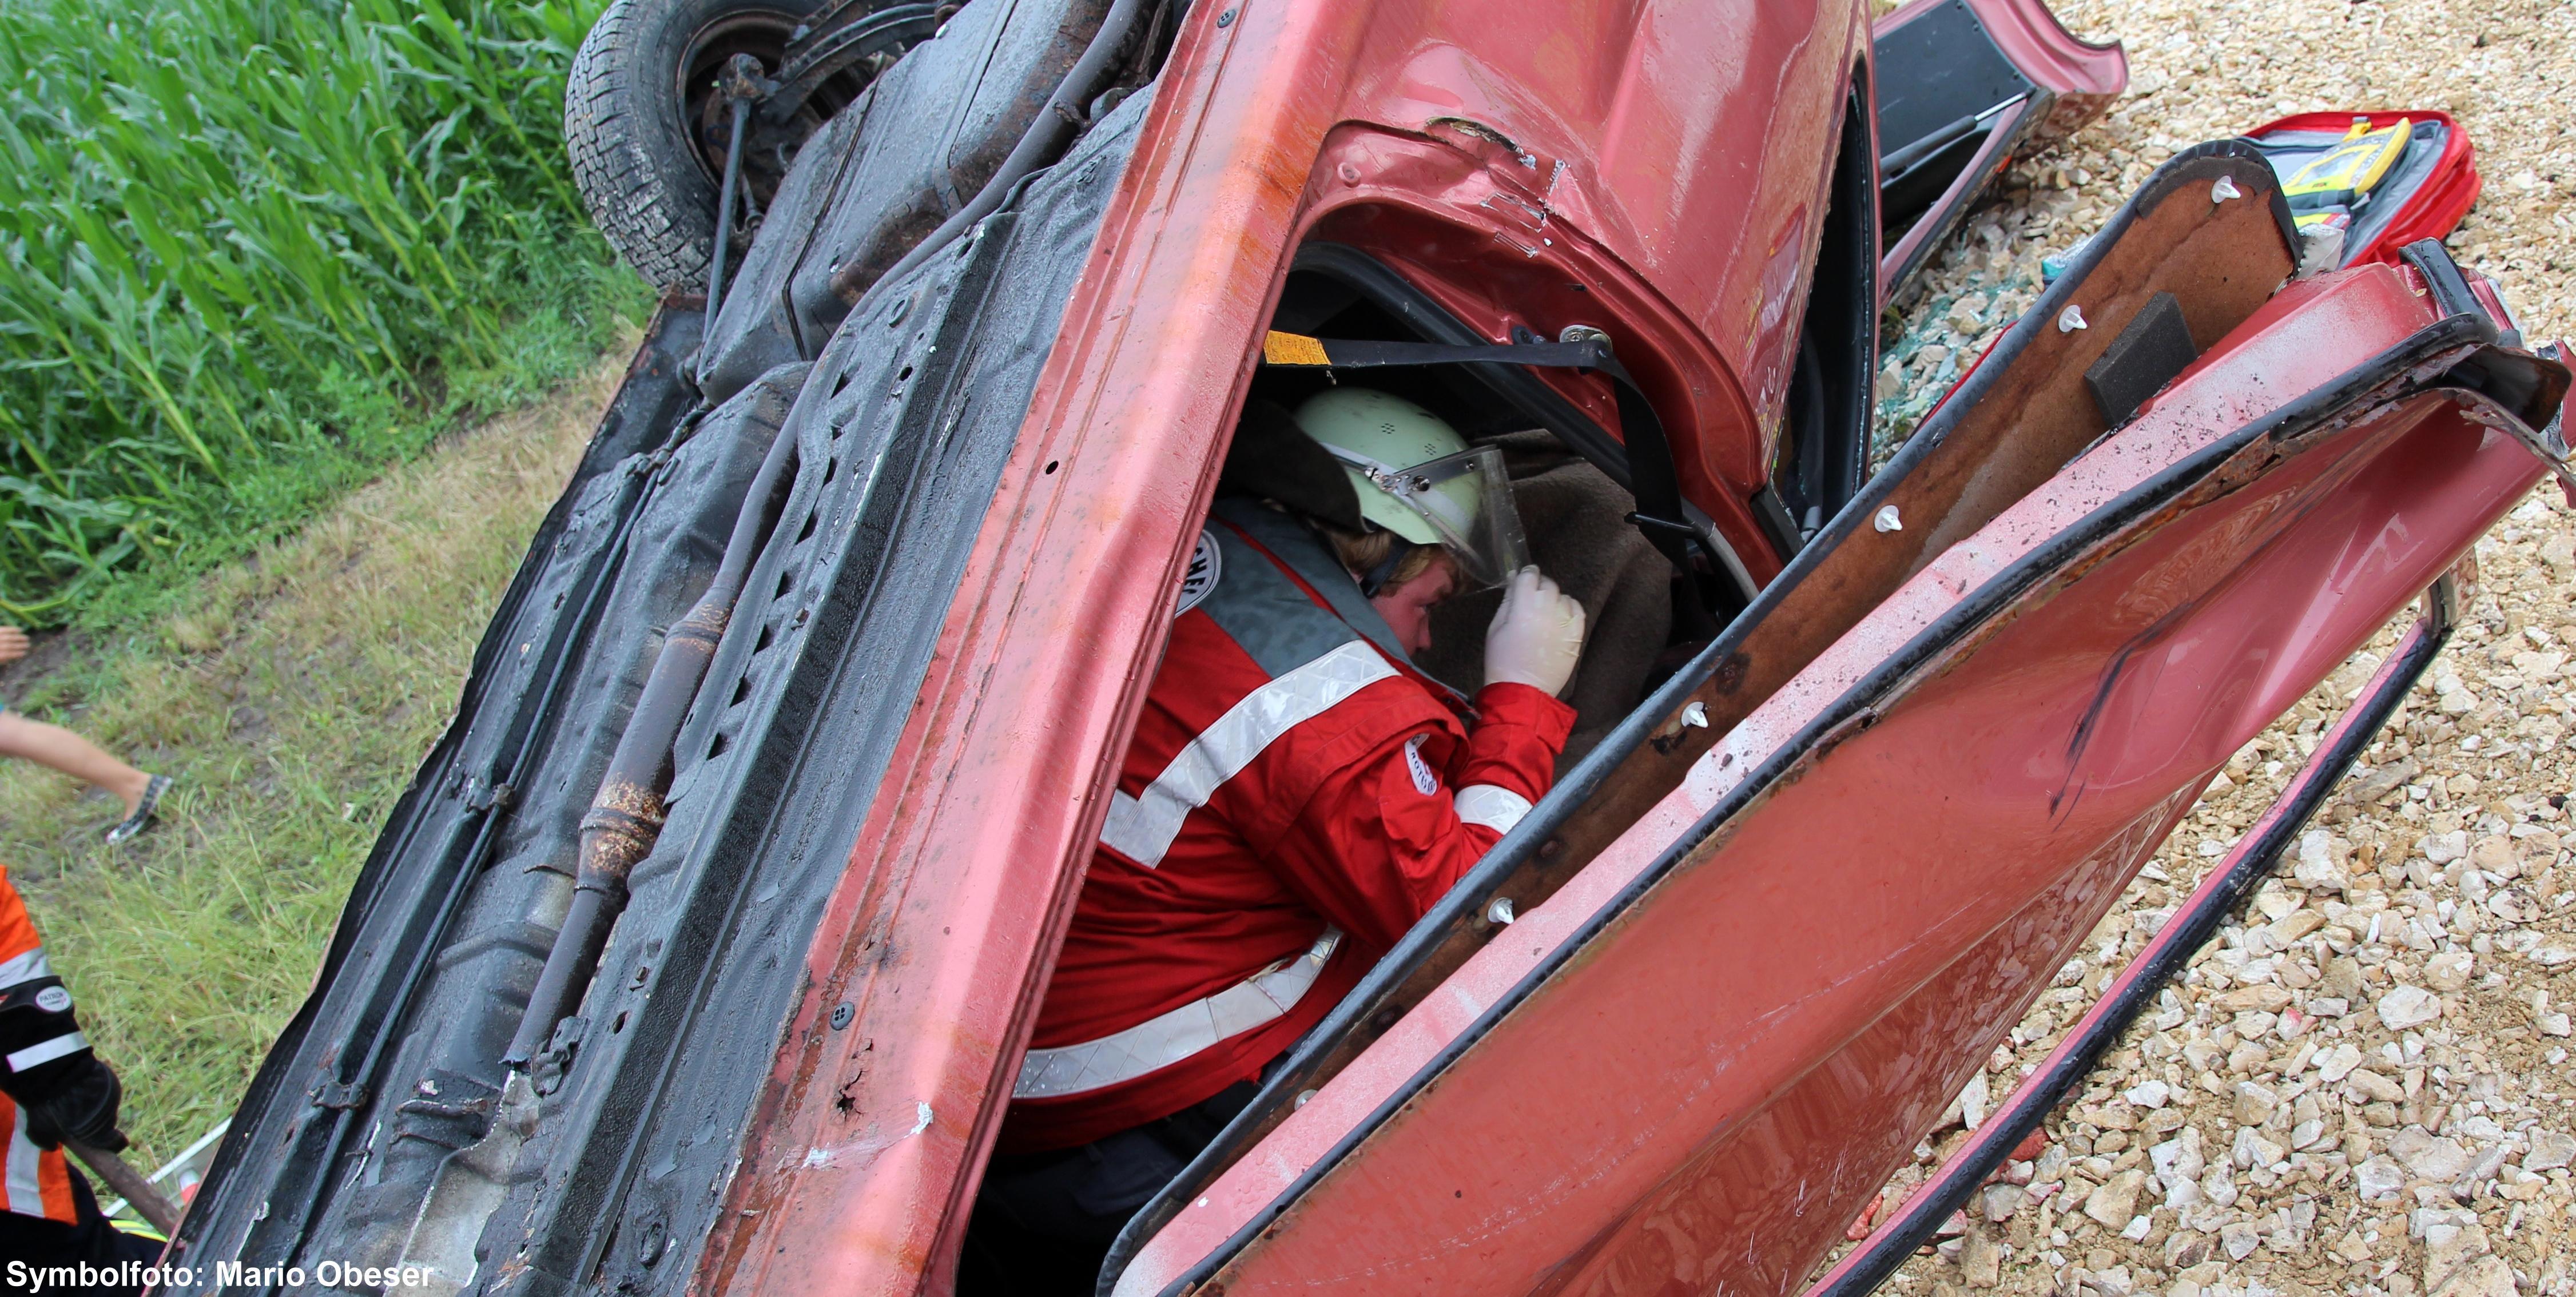 Verkehrsunfall, Bsaktuell, Schwaben Nachrichten, Mario Obeser, DRK